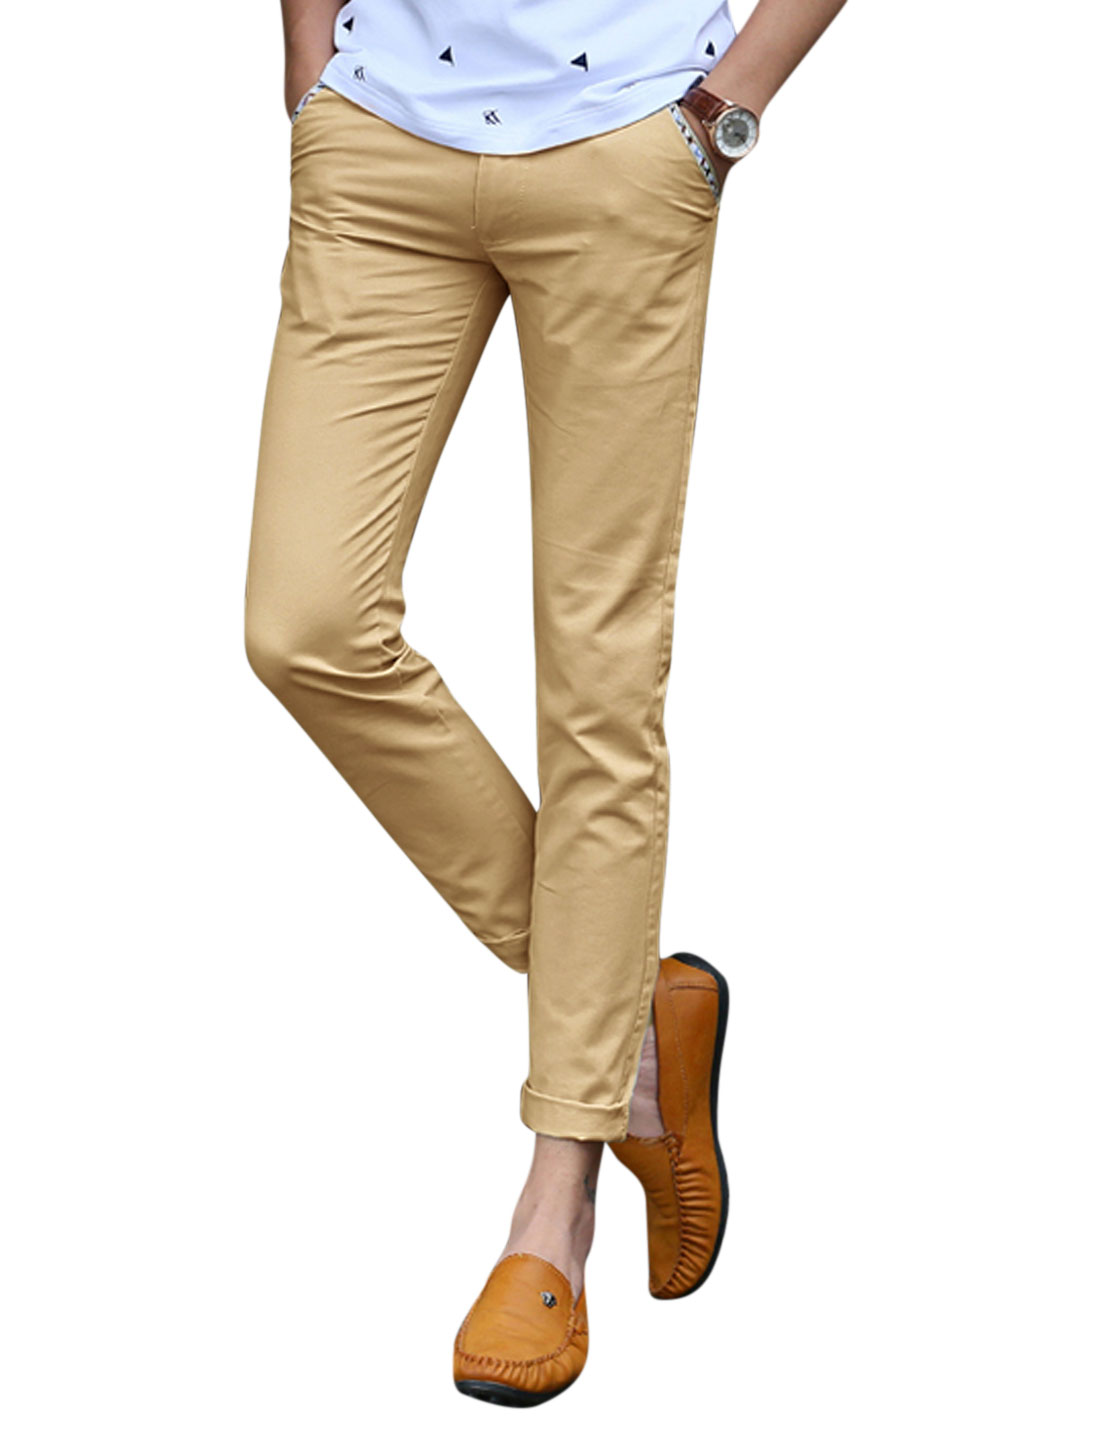 Men Mid Rise Zip Fly Flap Design Casual Trousers Khaki W30